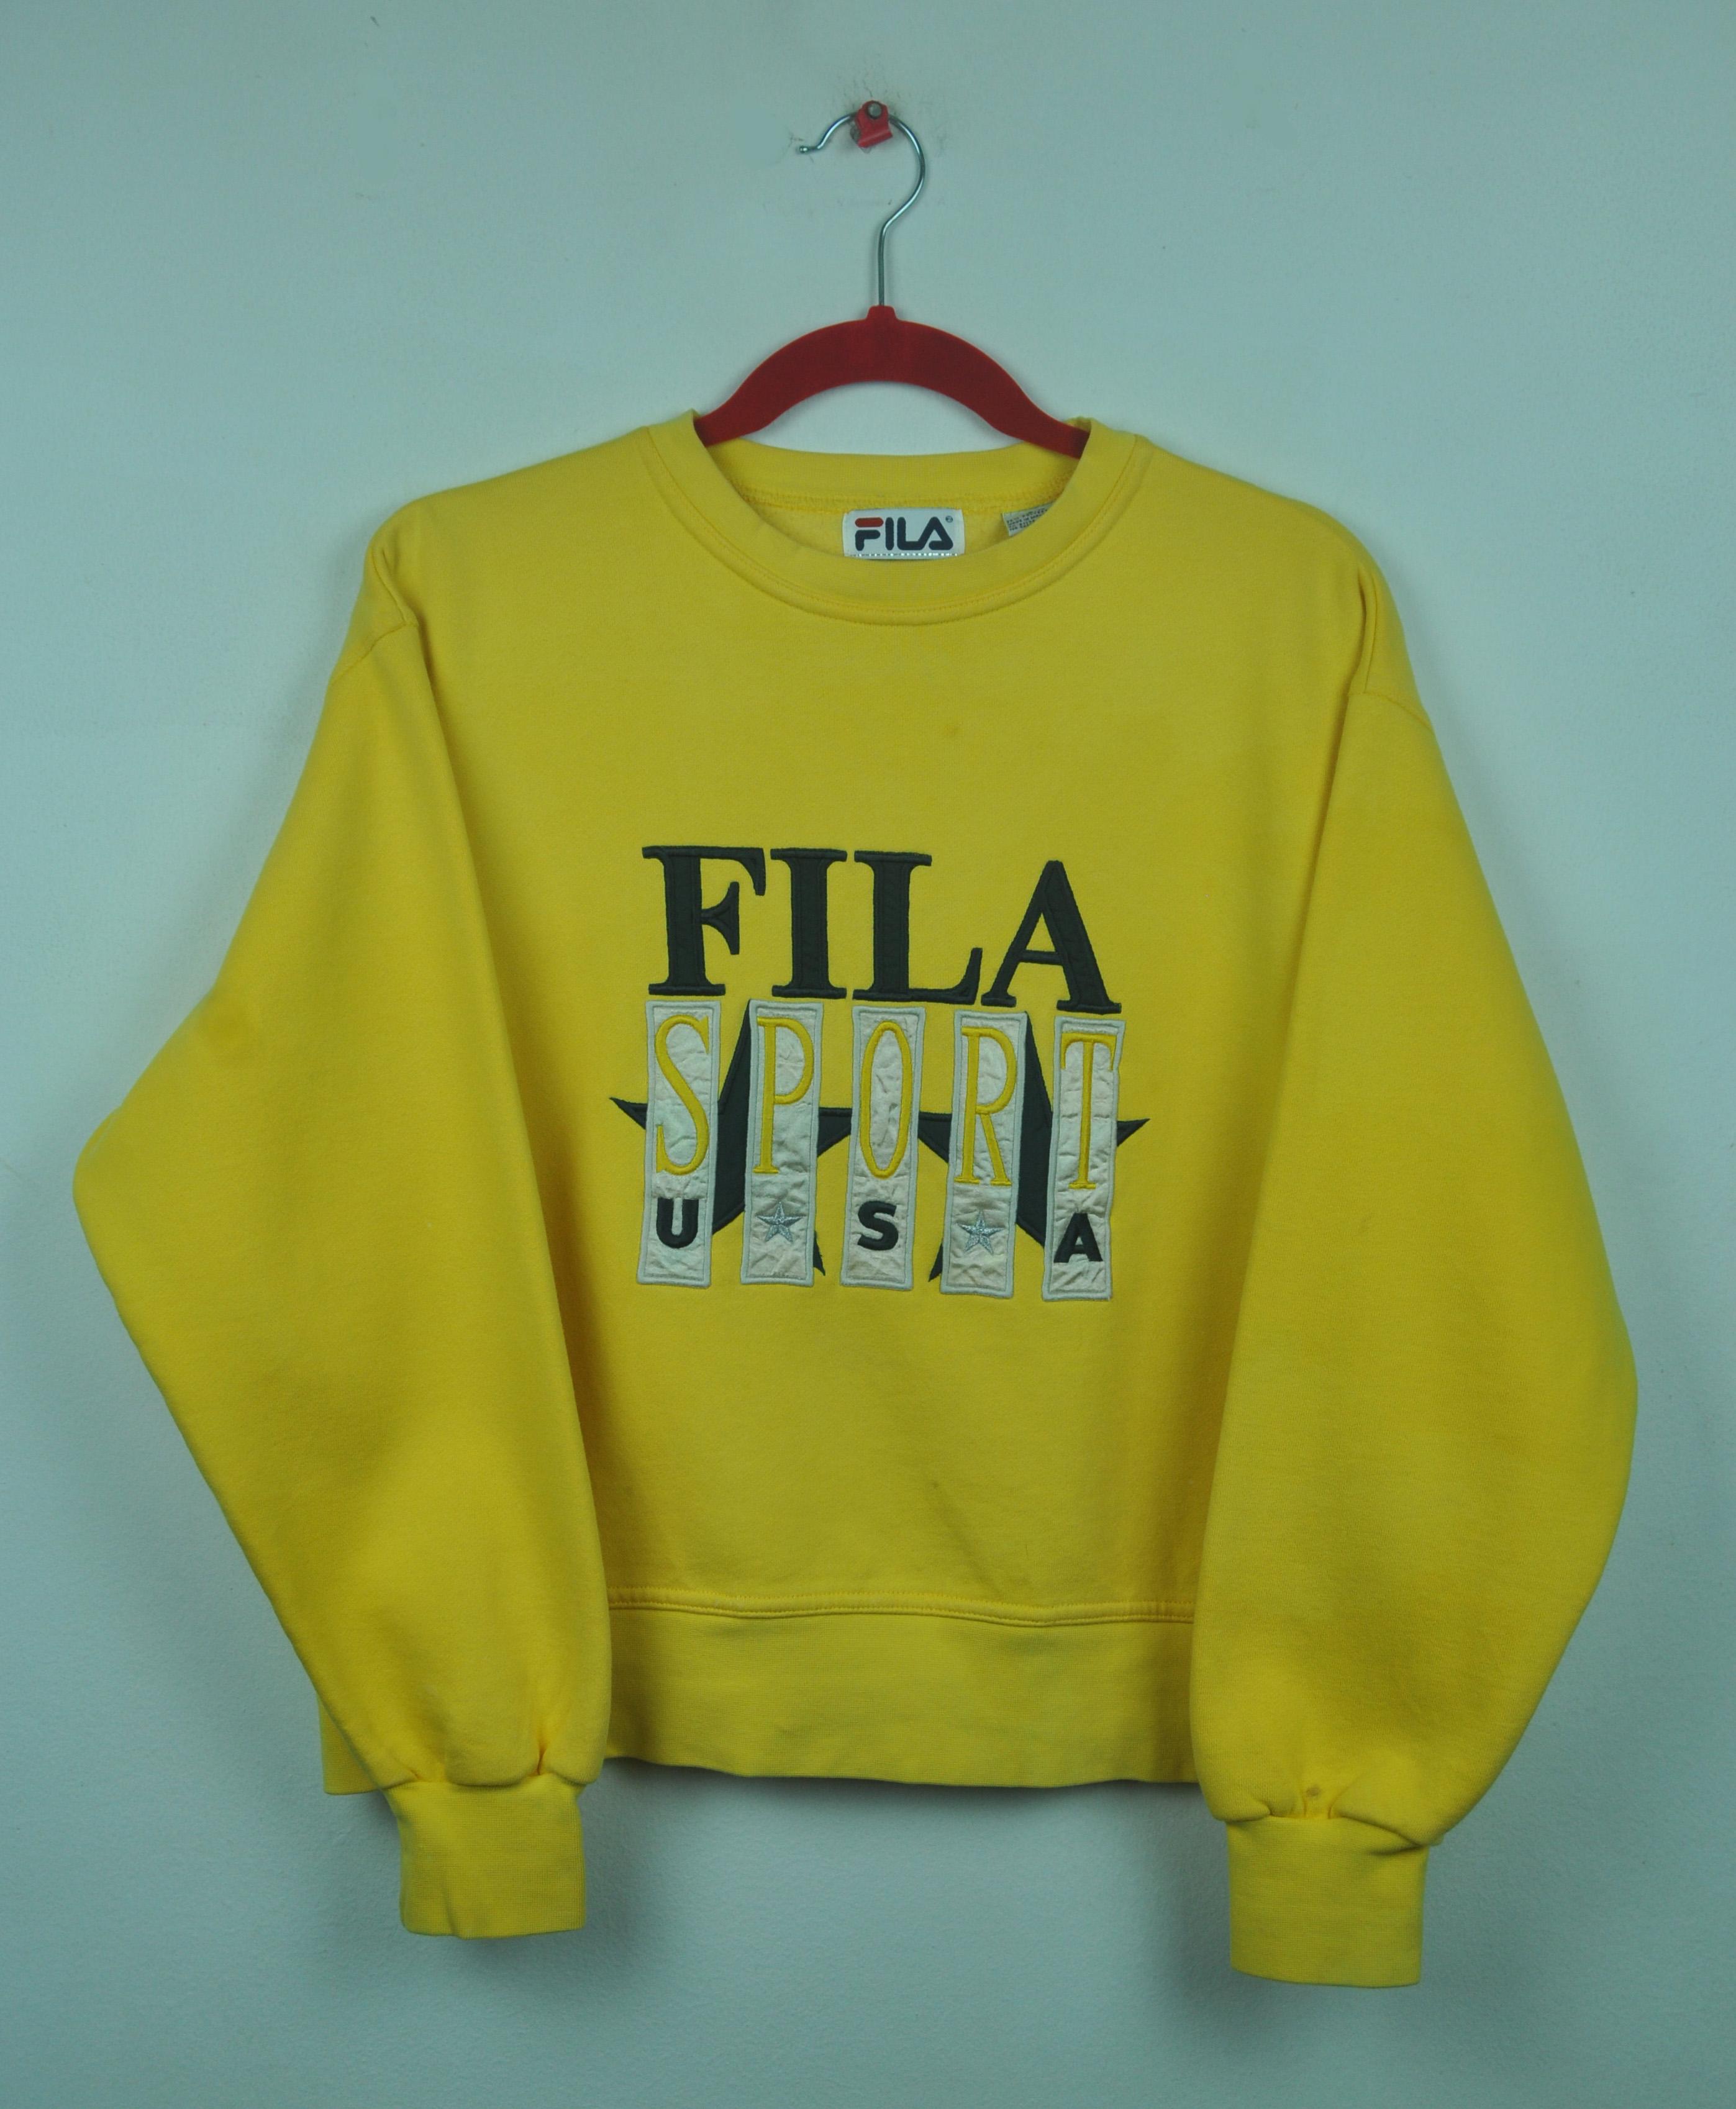 7df2f9c6c552 Vintage 90s Fila Embroidered Fila Sport USA CrewNeck Pullover ...